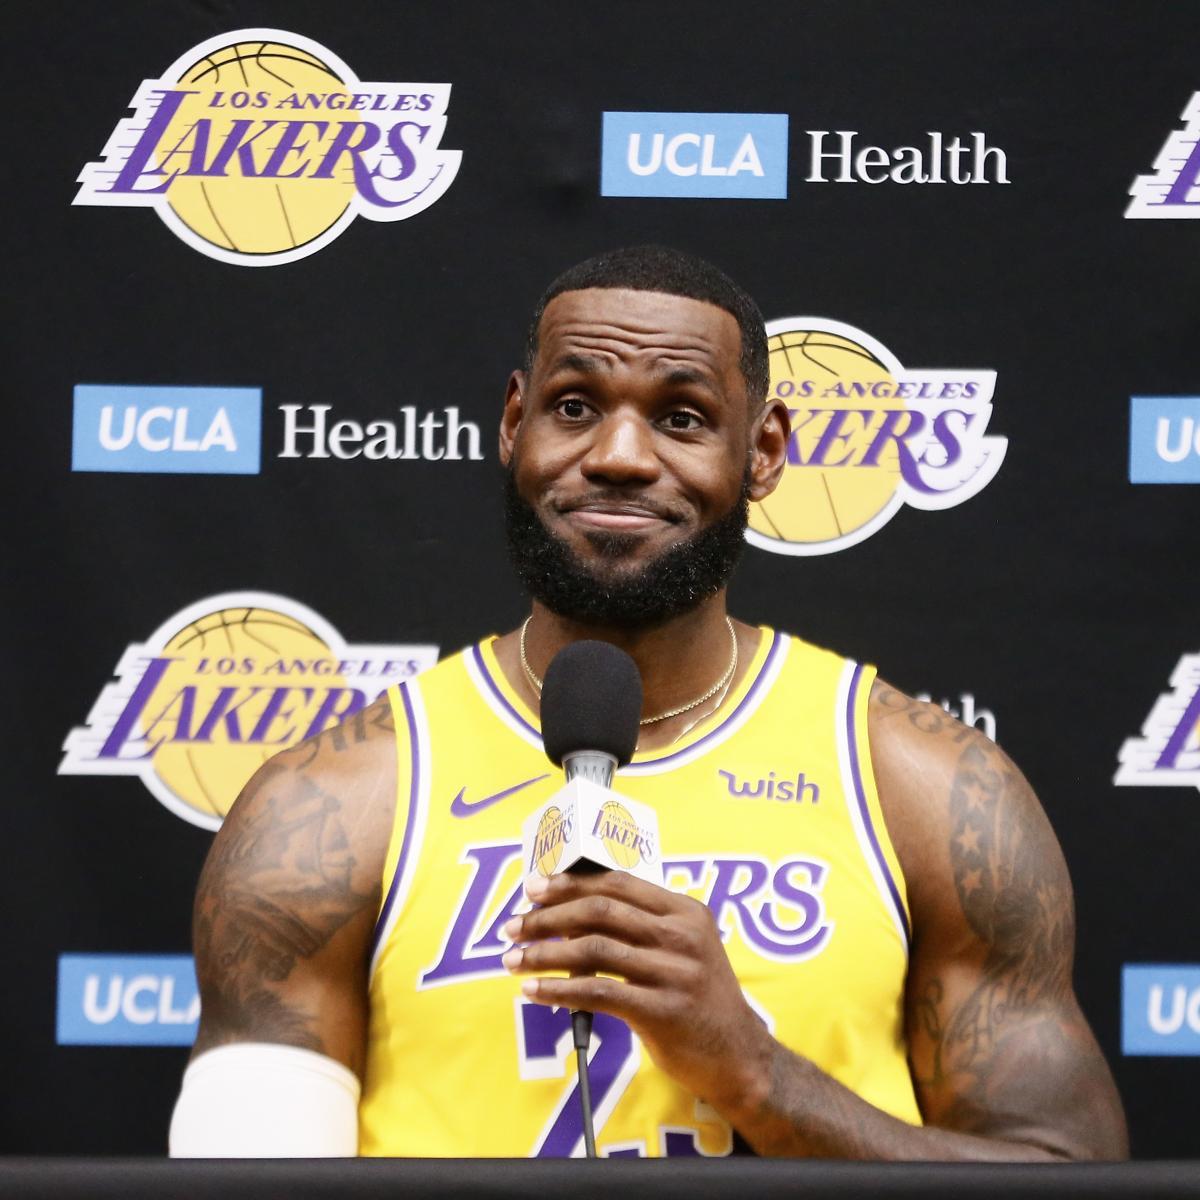 Lakers News: Frank Vogel Reveals Plan For LeBron James In